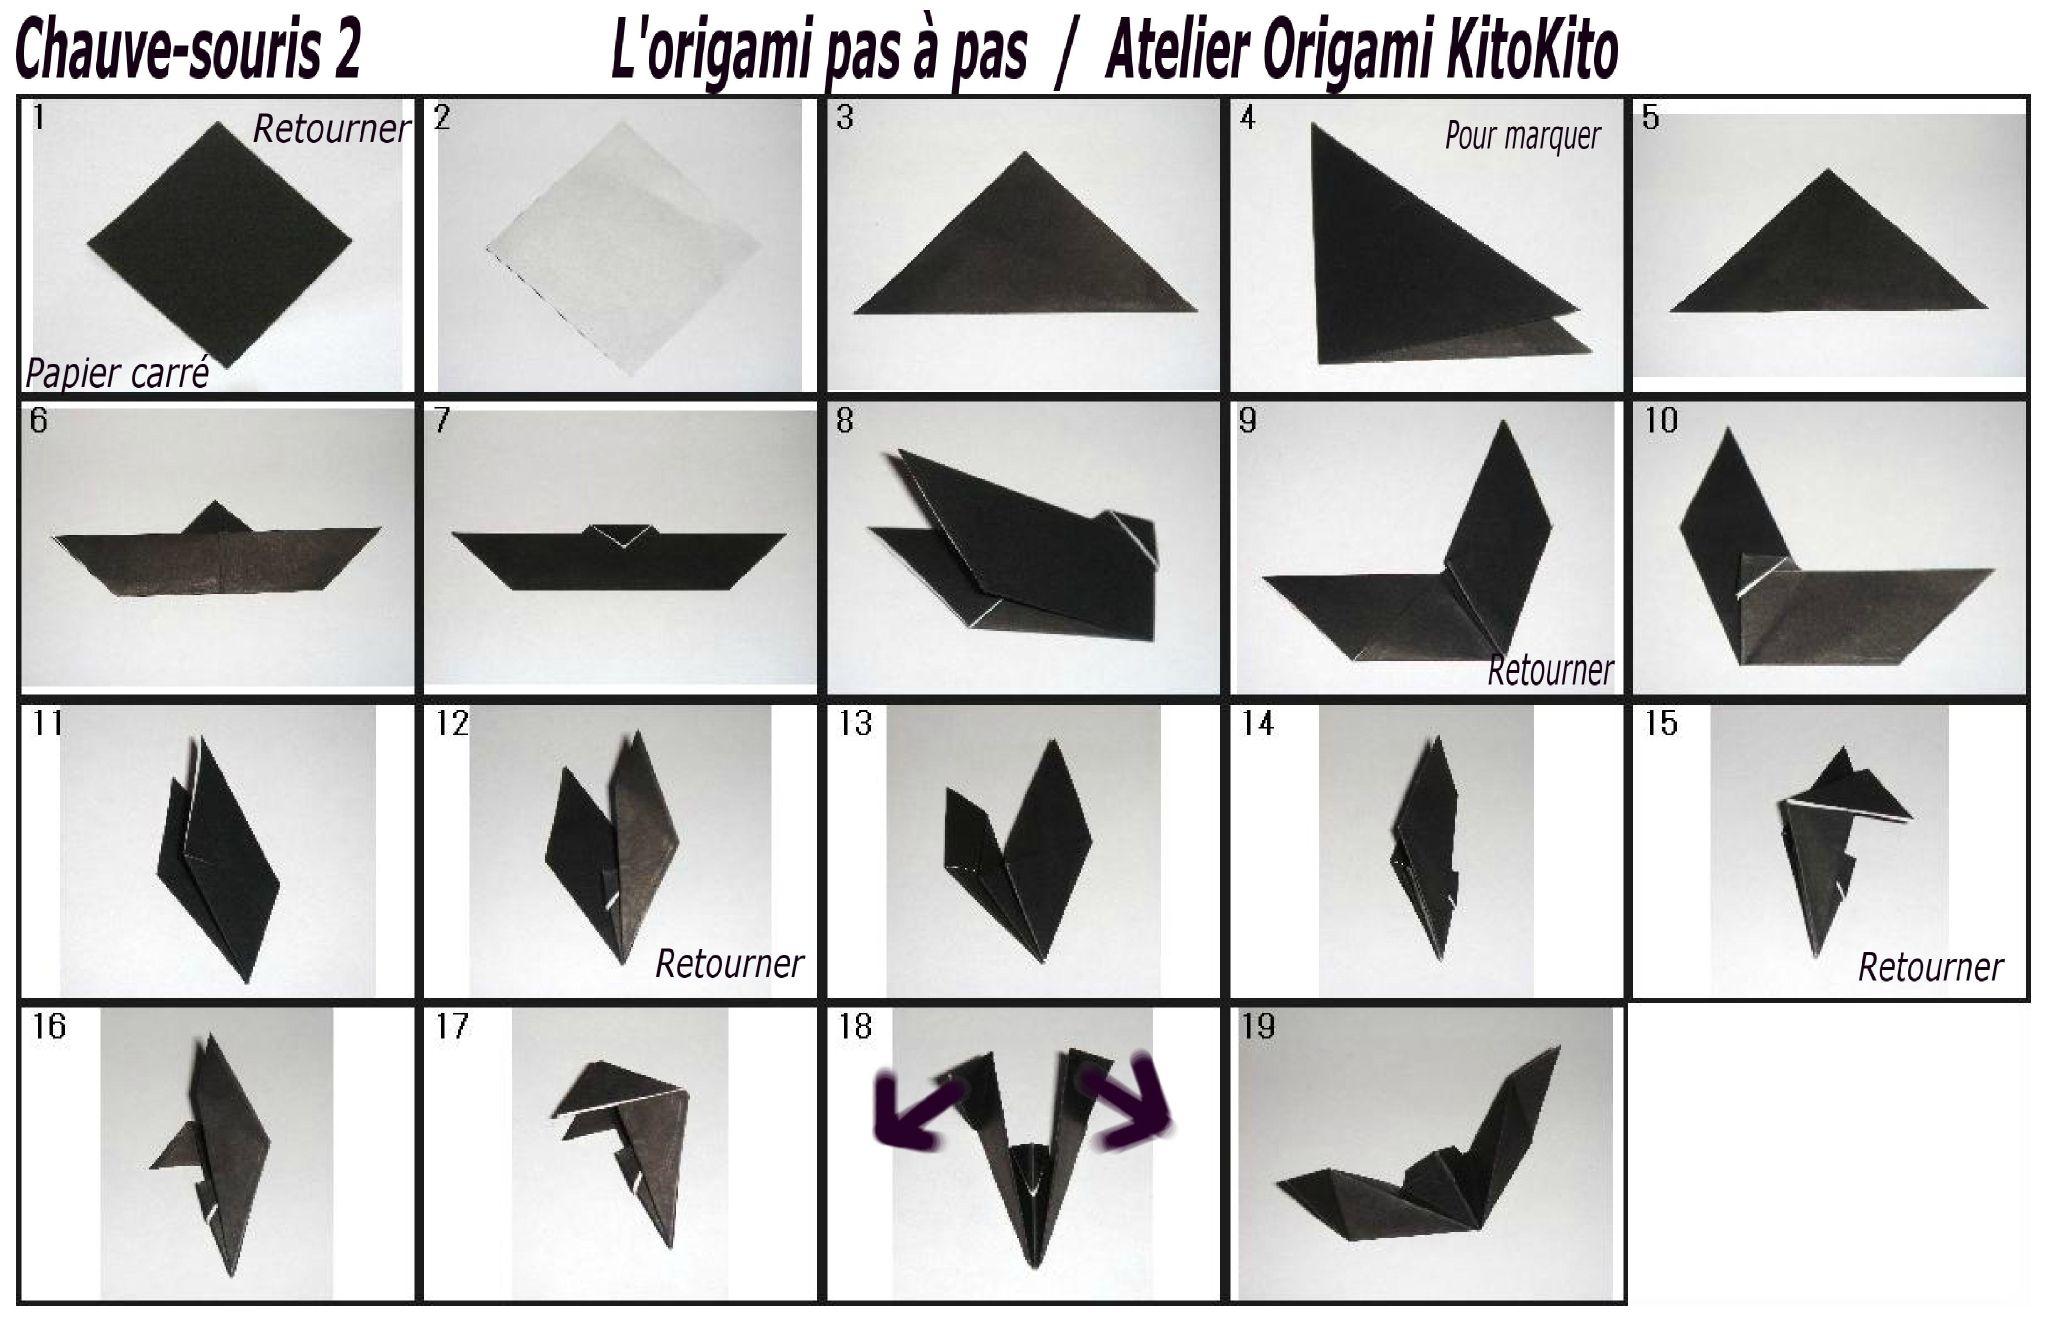 origami facile chauve souris